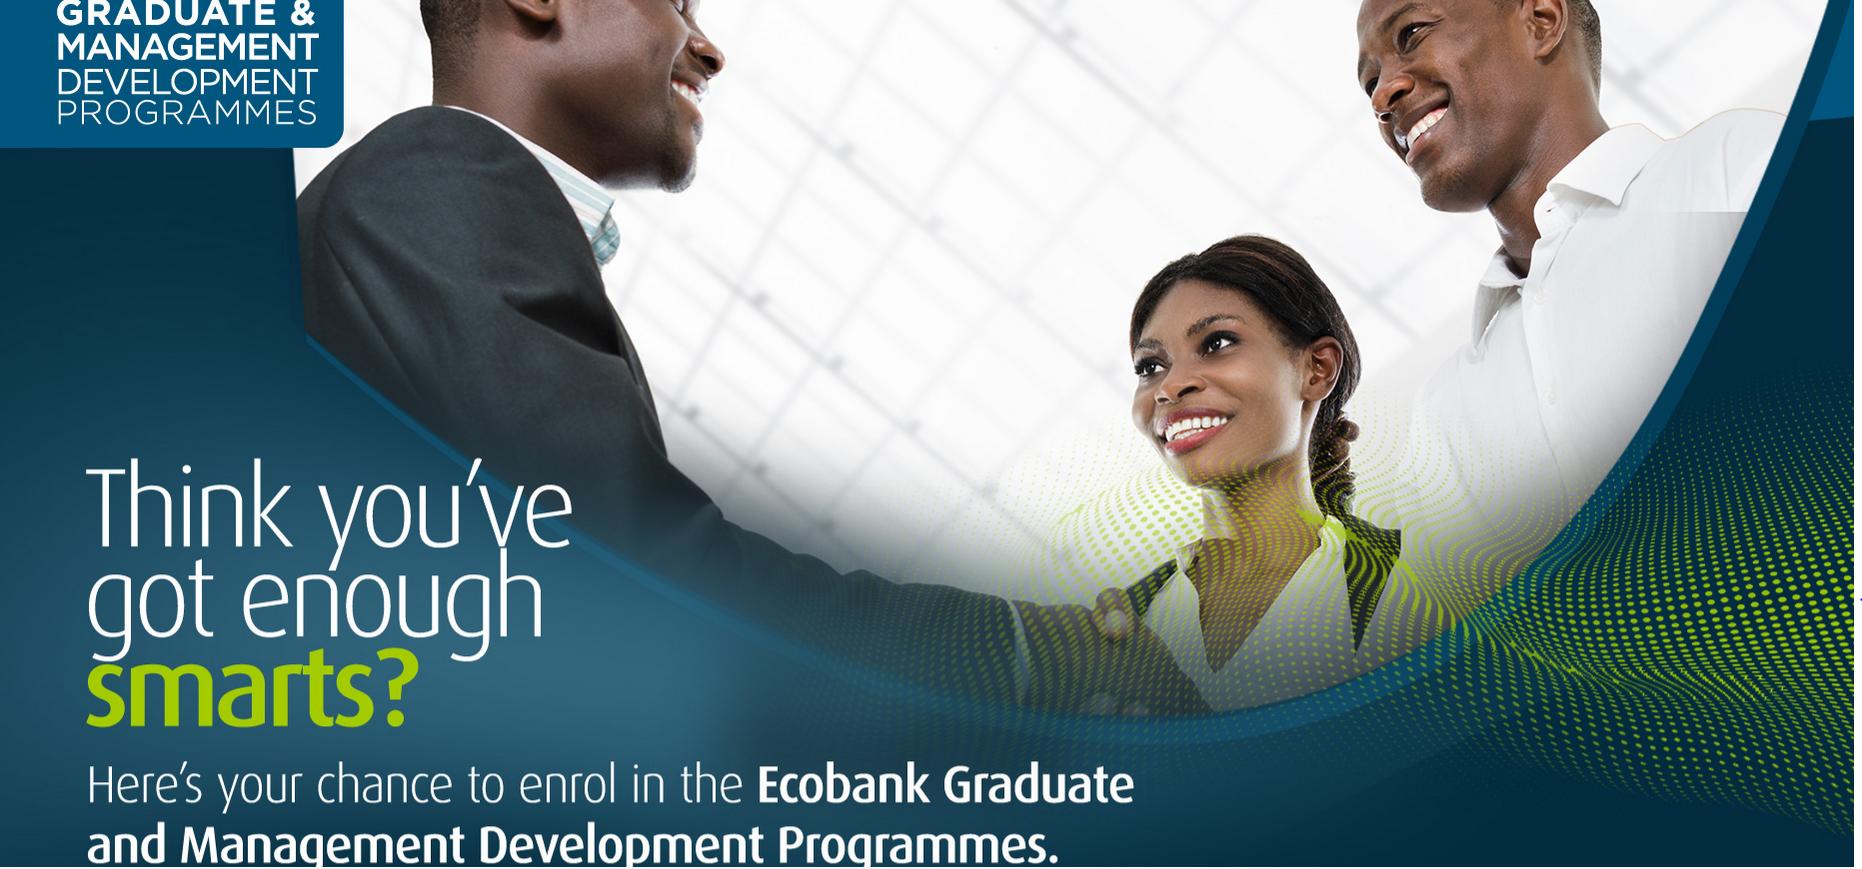 Ecobank Management/Graduate Advancement Program (EMDP) 2019 for young specialists